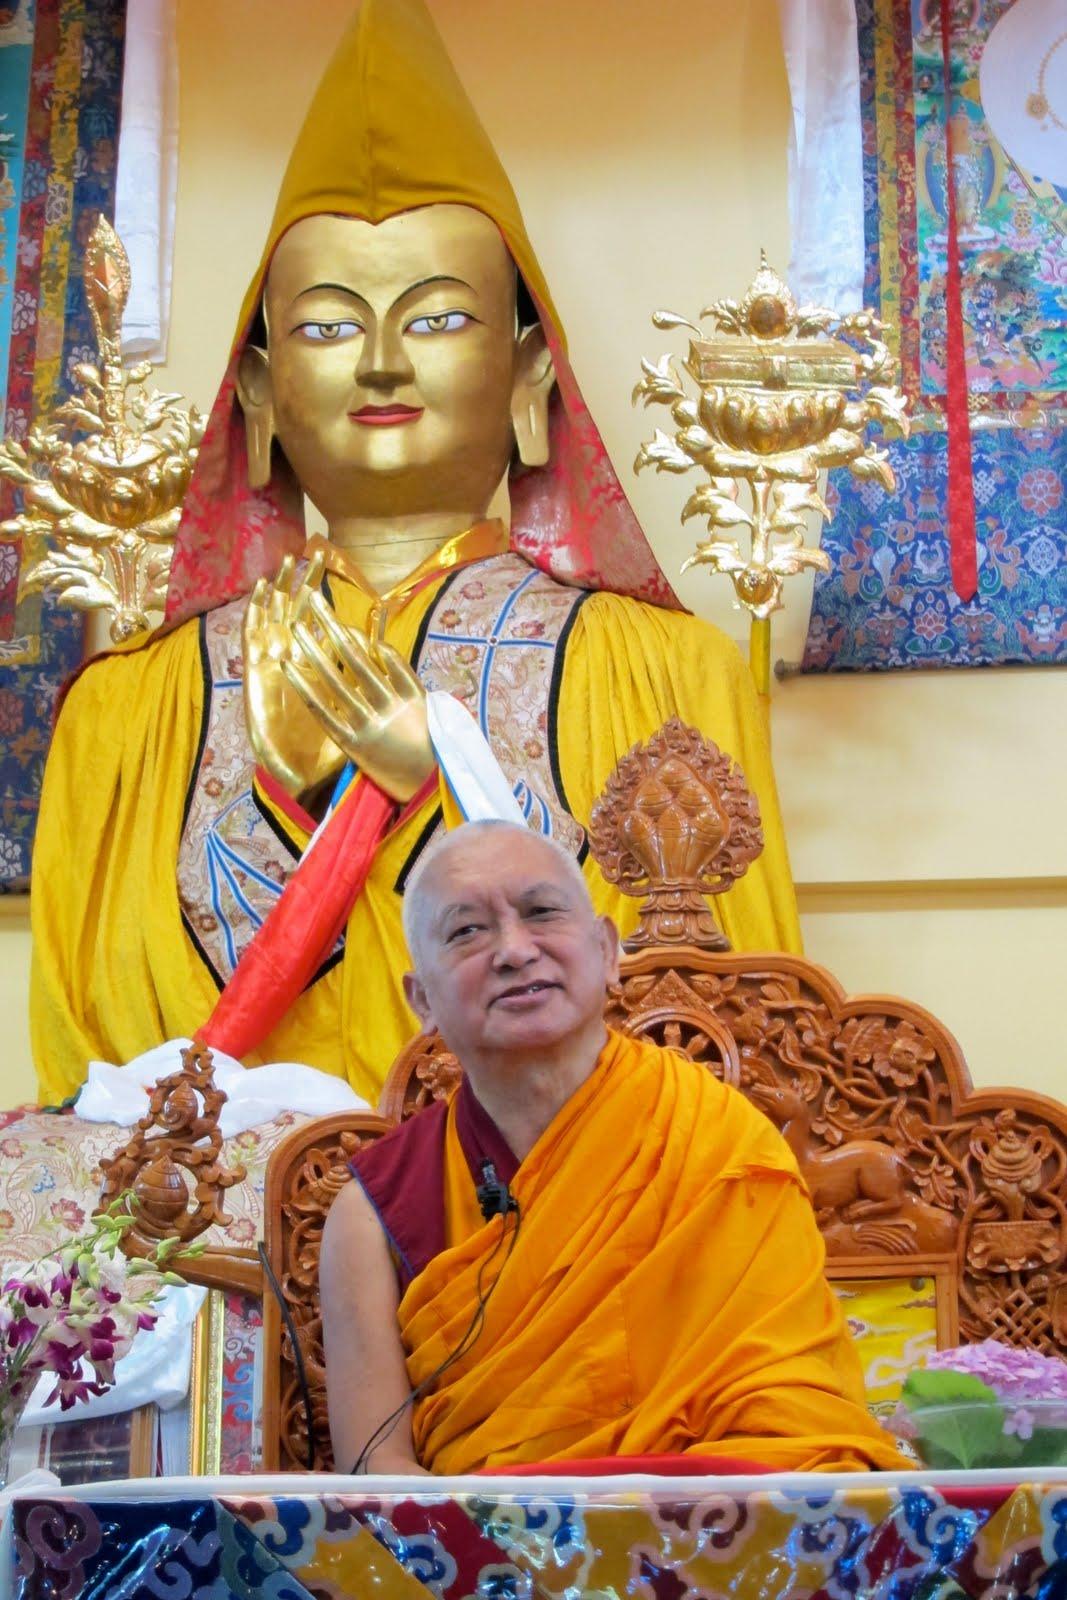 Lama Zopa Rinpoche teaching at Tushita Meditation Centre, June 13, 2013. Photo: Ven.Sarah Thresher